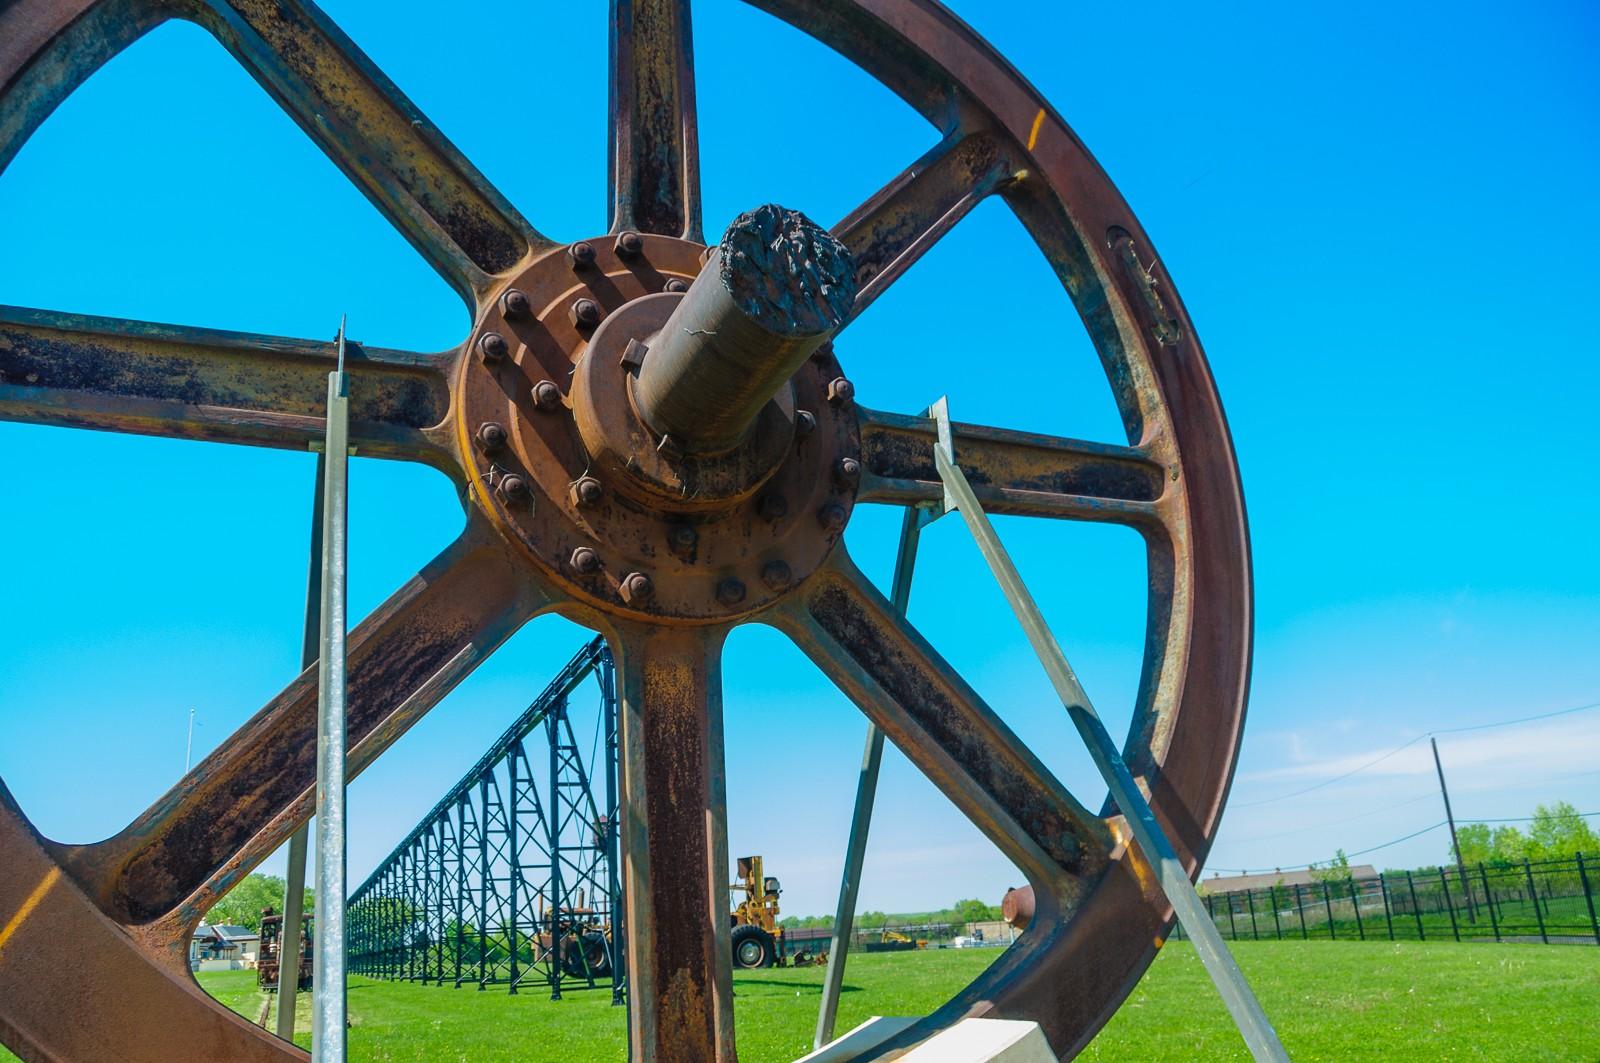 iron-wheel-7590